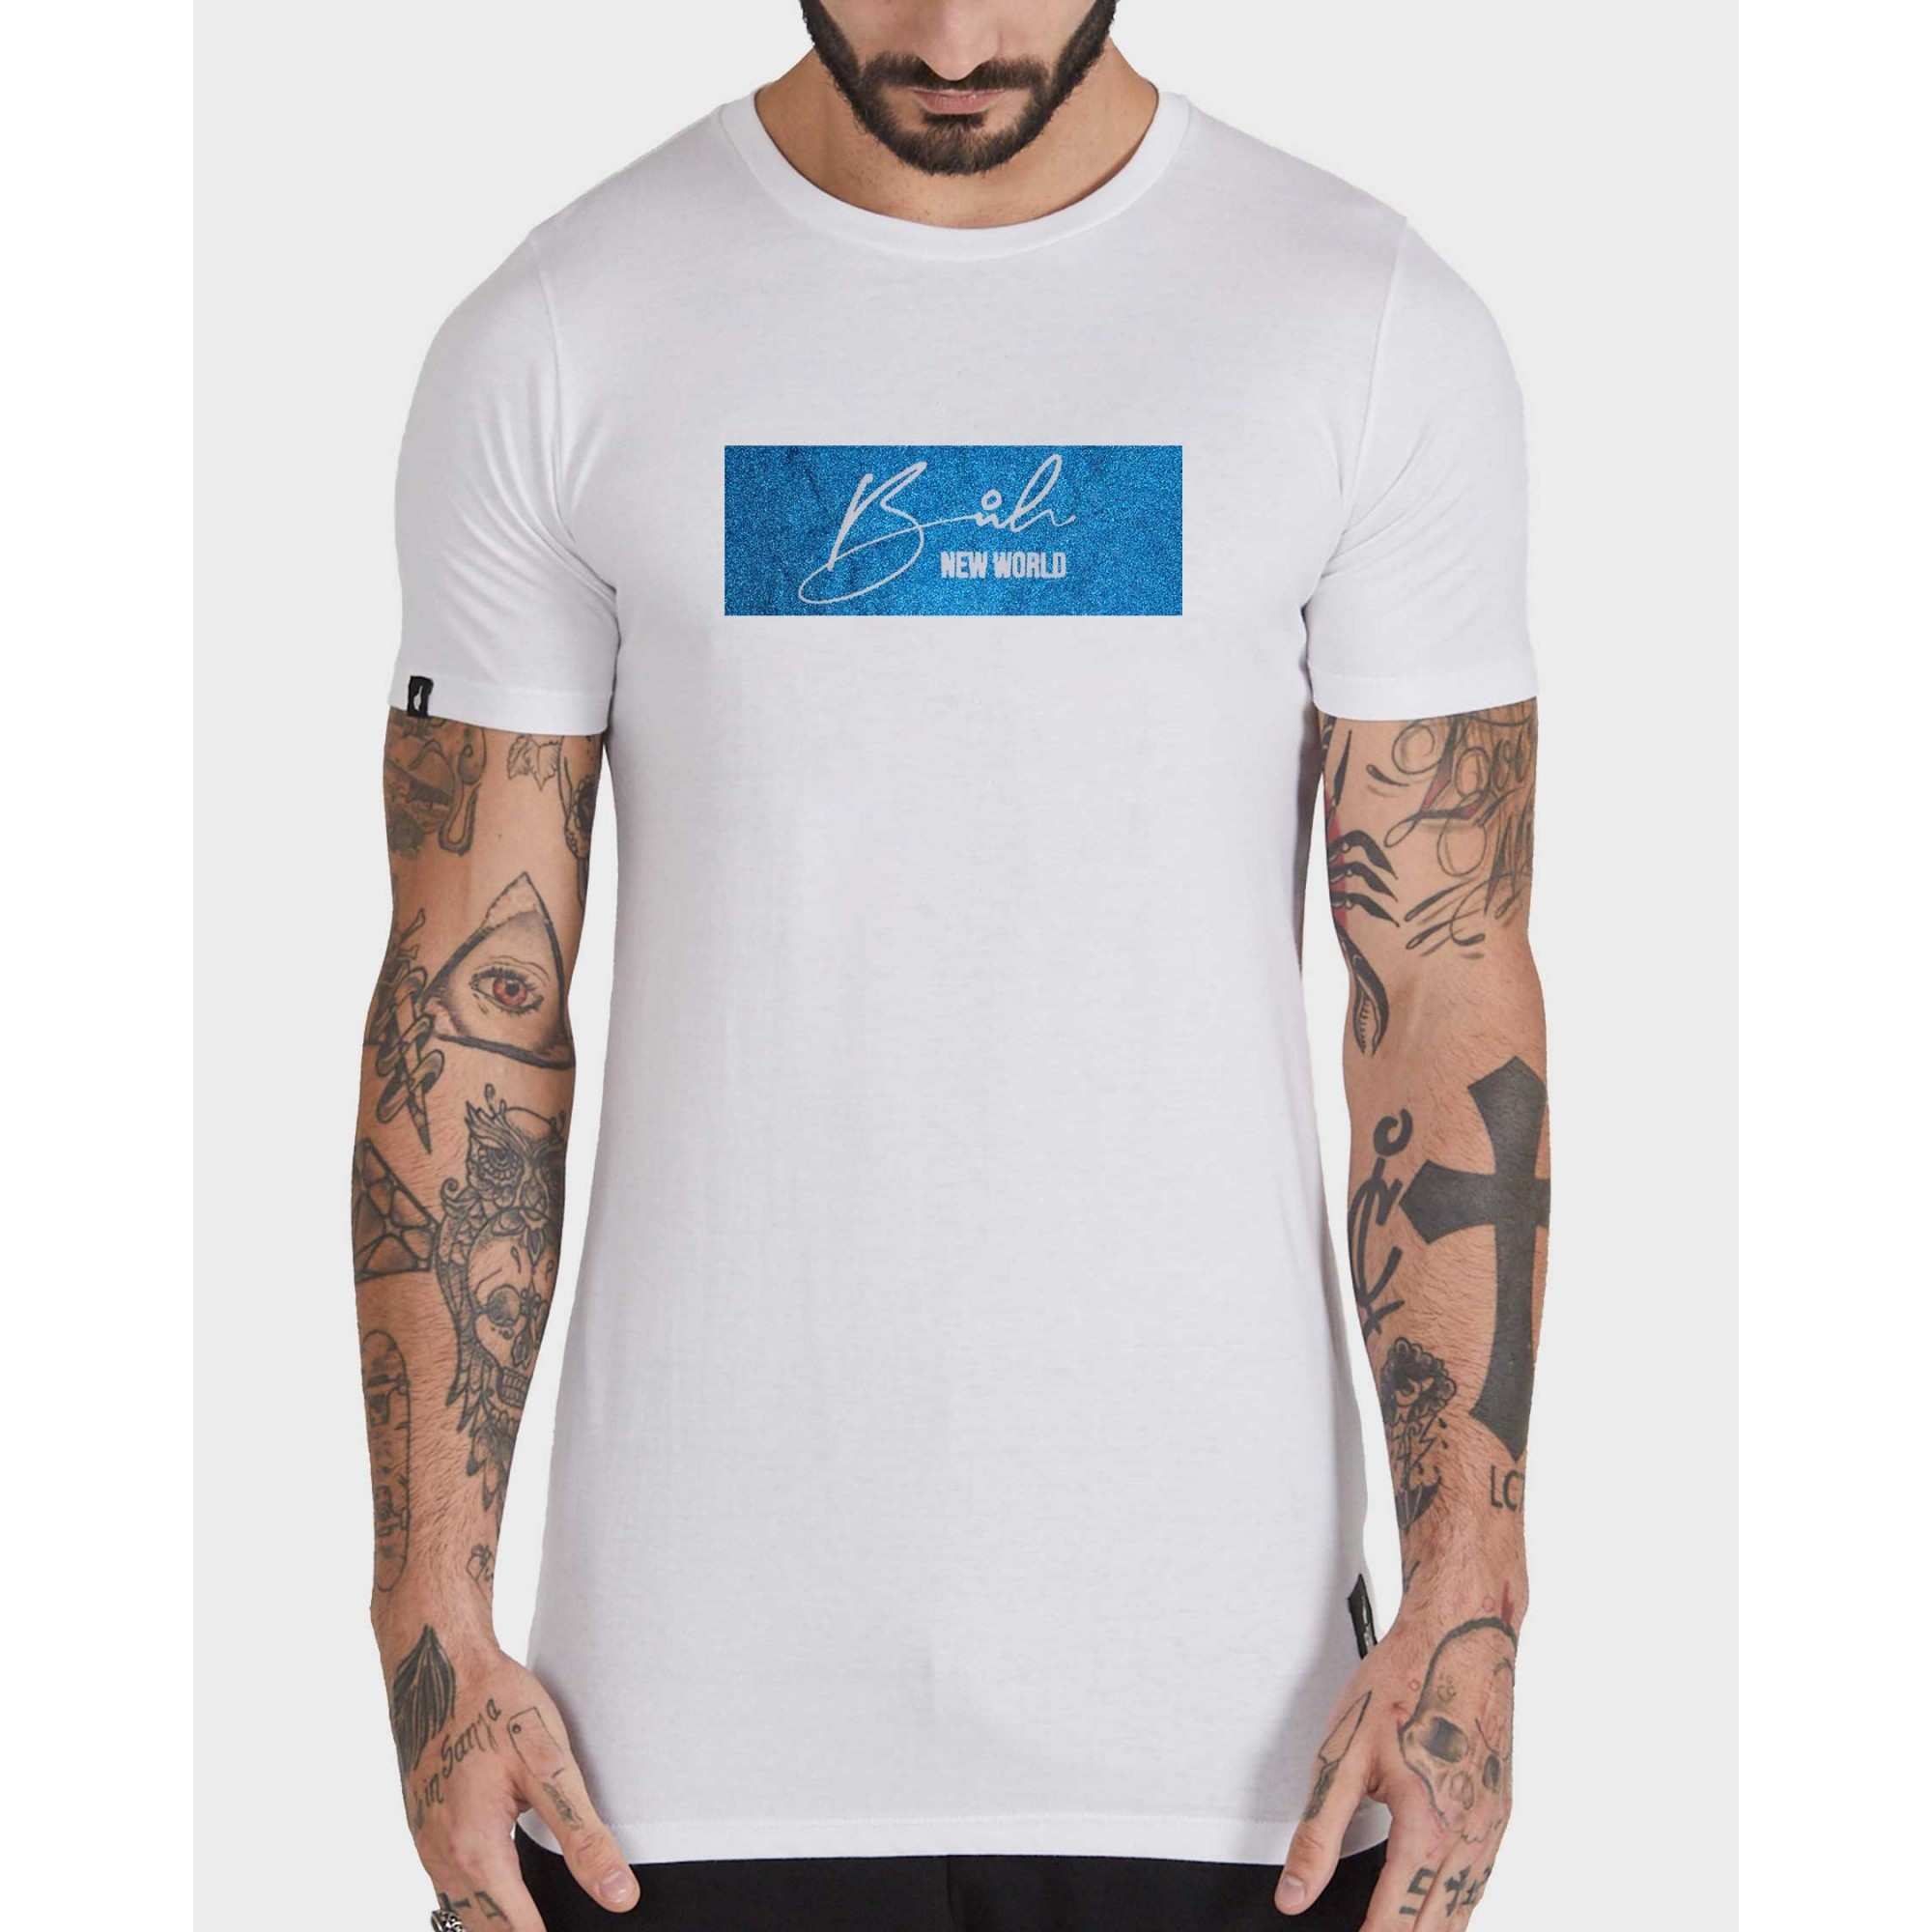 Camiseta Buh Glitter White & Blue